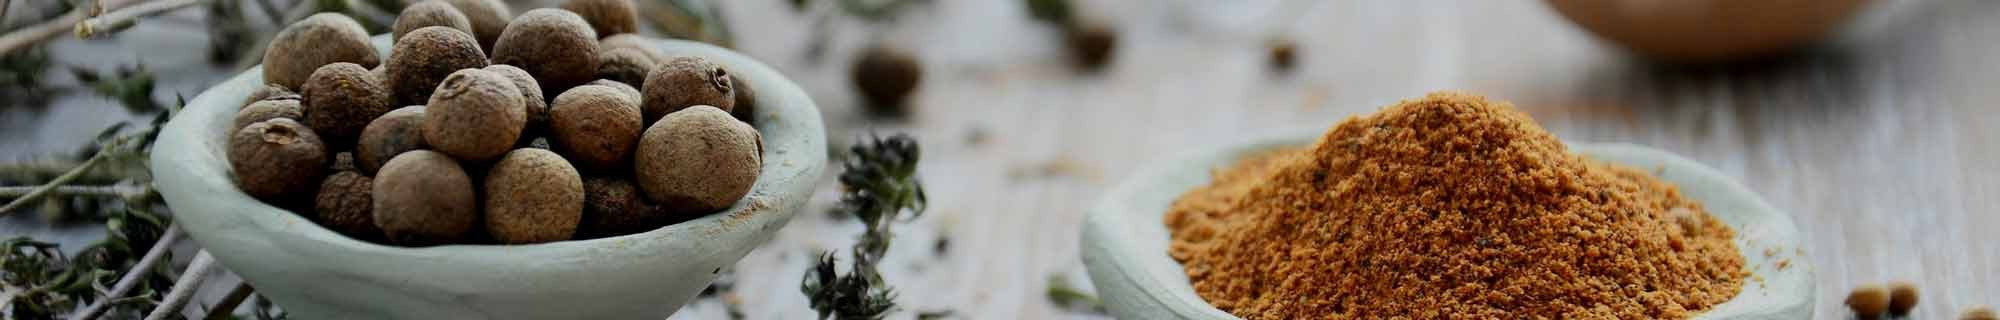 Spezie Nostrane|Vendita Online Piante Officinali |Tipicosiciliano Shop